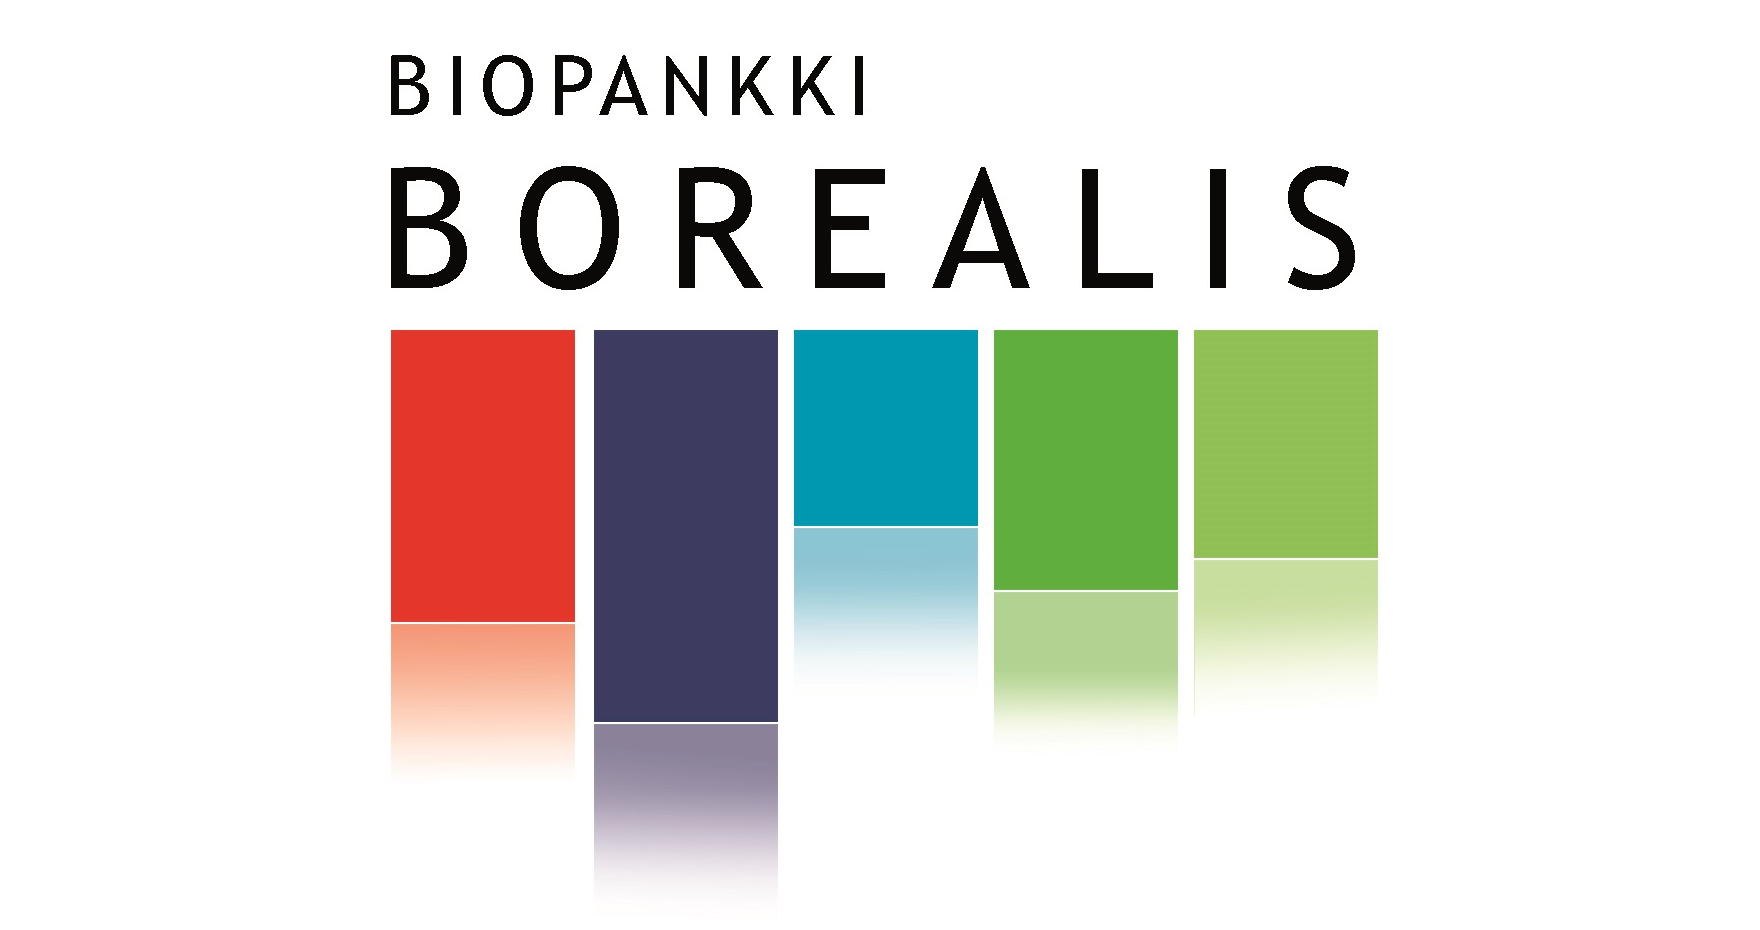 Biopankki Borealis